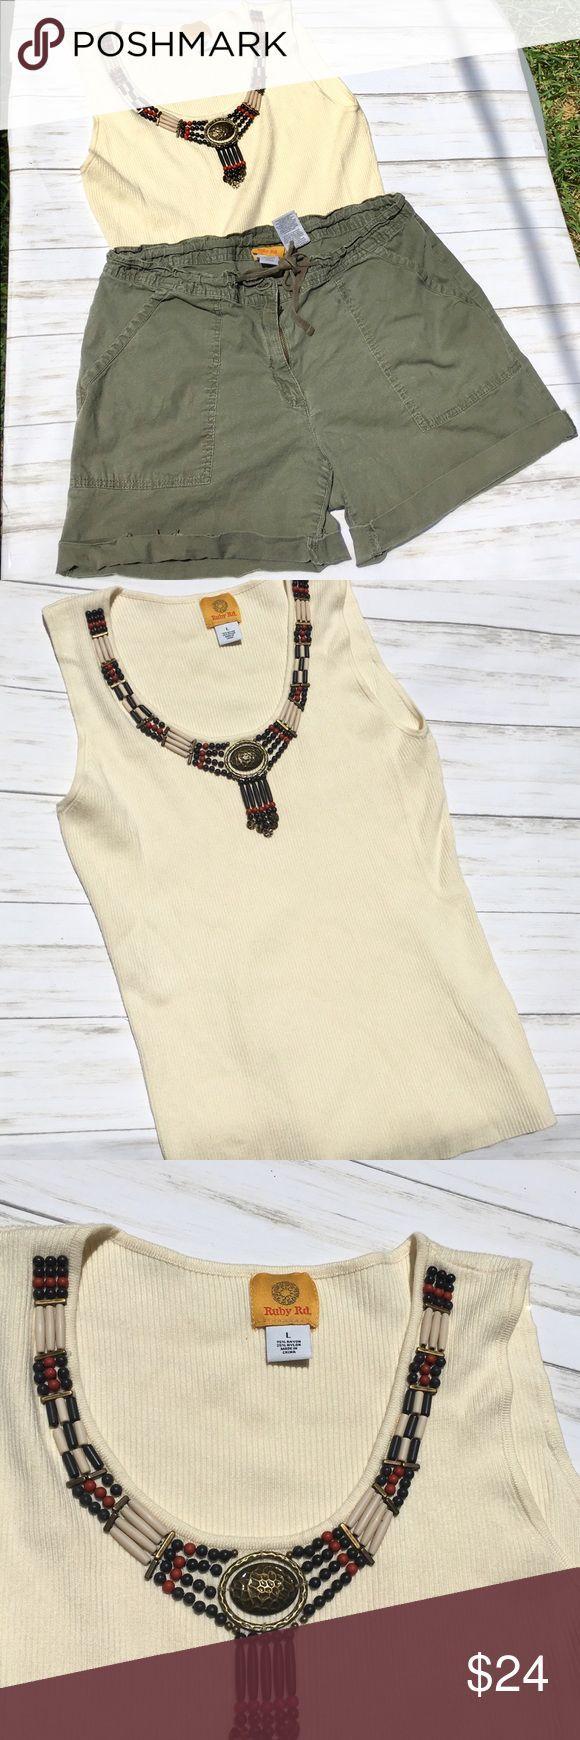 Großes 12 Ruby Rd Wander-Outfit-Bundle für Damen Ein super süßes Outdoor-Out…